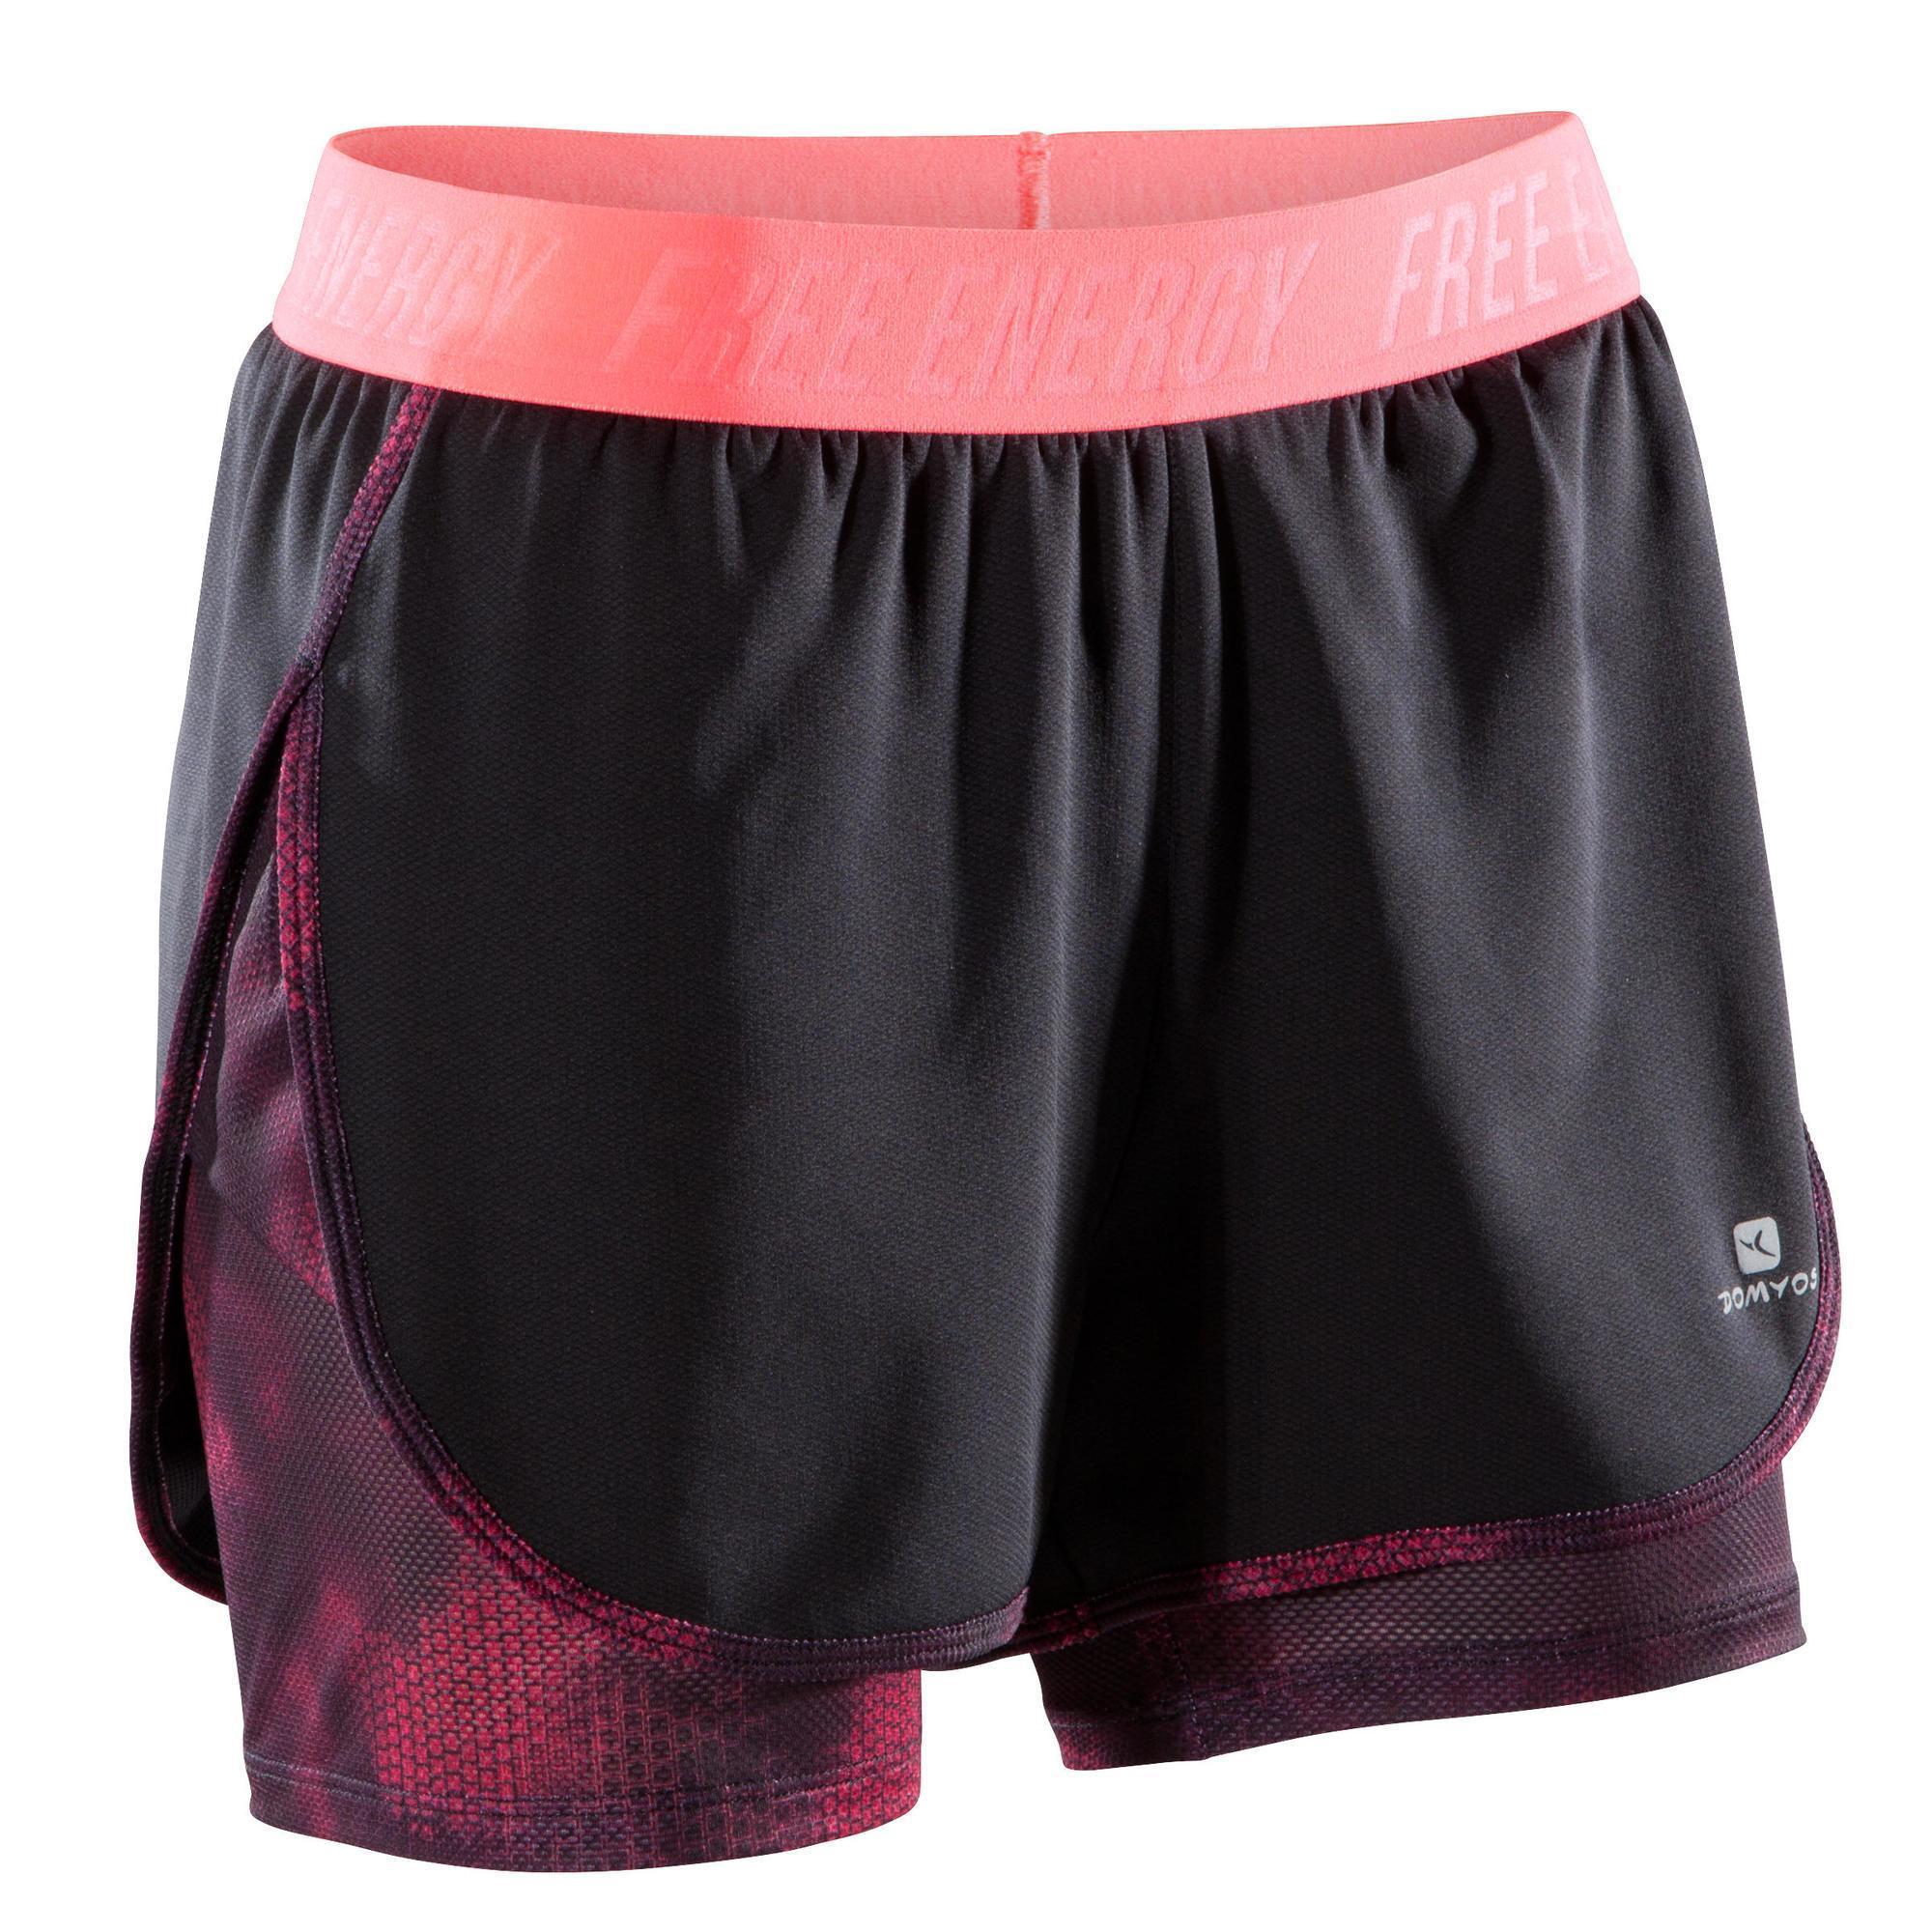 Kurze Hosen, Shorts Damen   Sport erleben   DECATHLON 5dd7b72abd